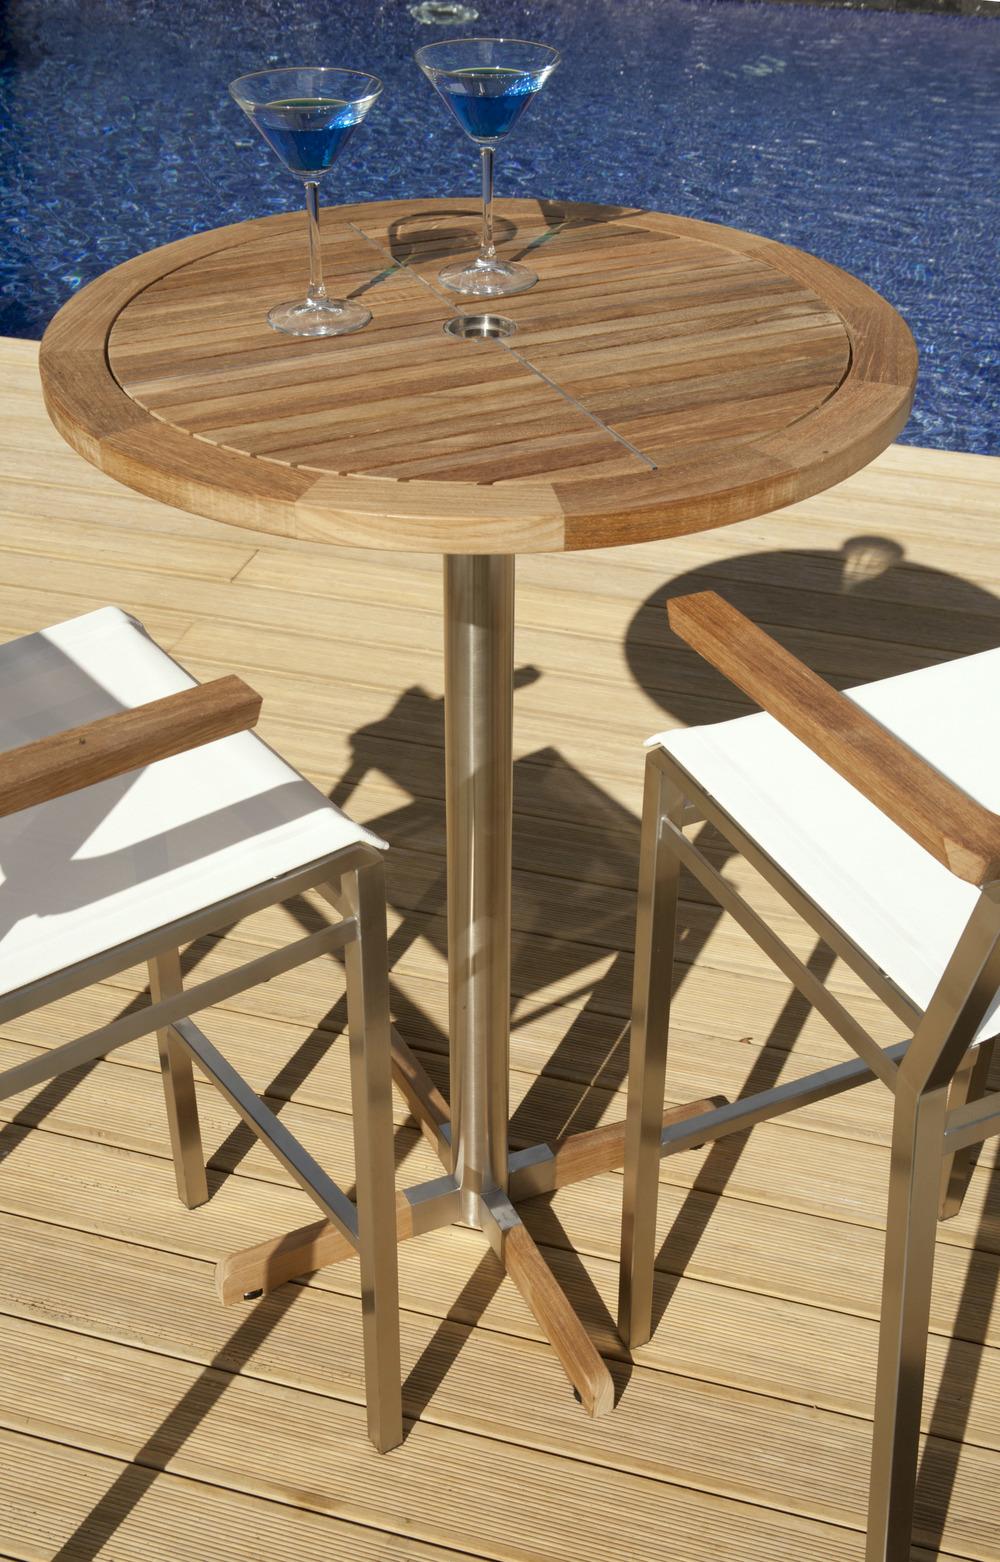 Barlow Tyrie - Equinox Circular Pedestal High Dining Table